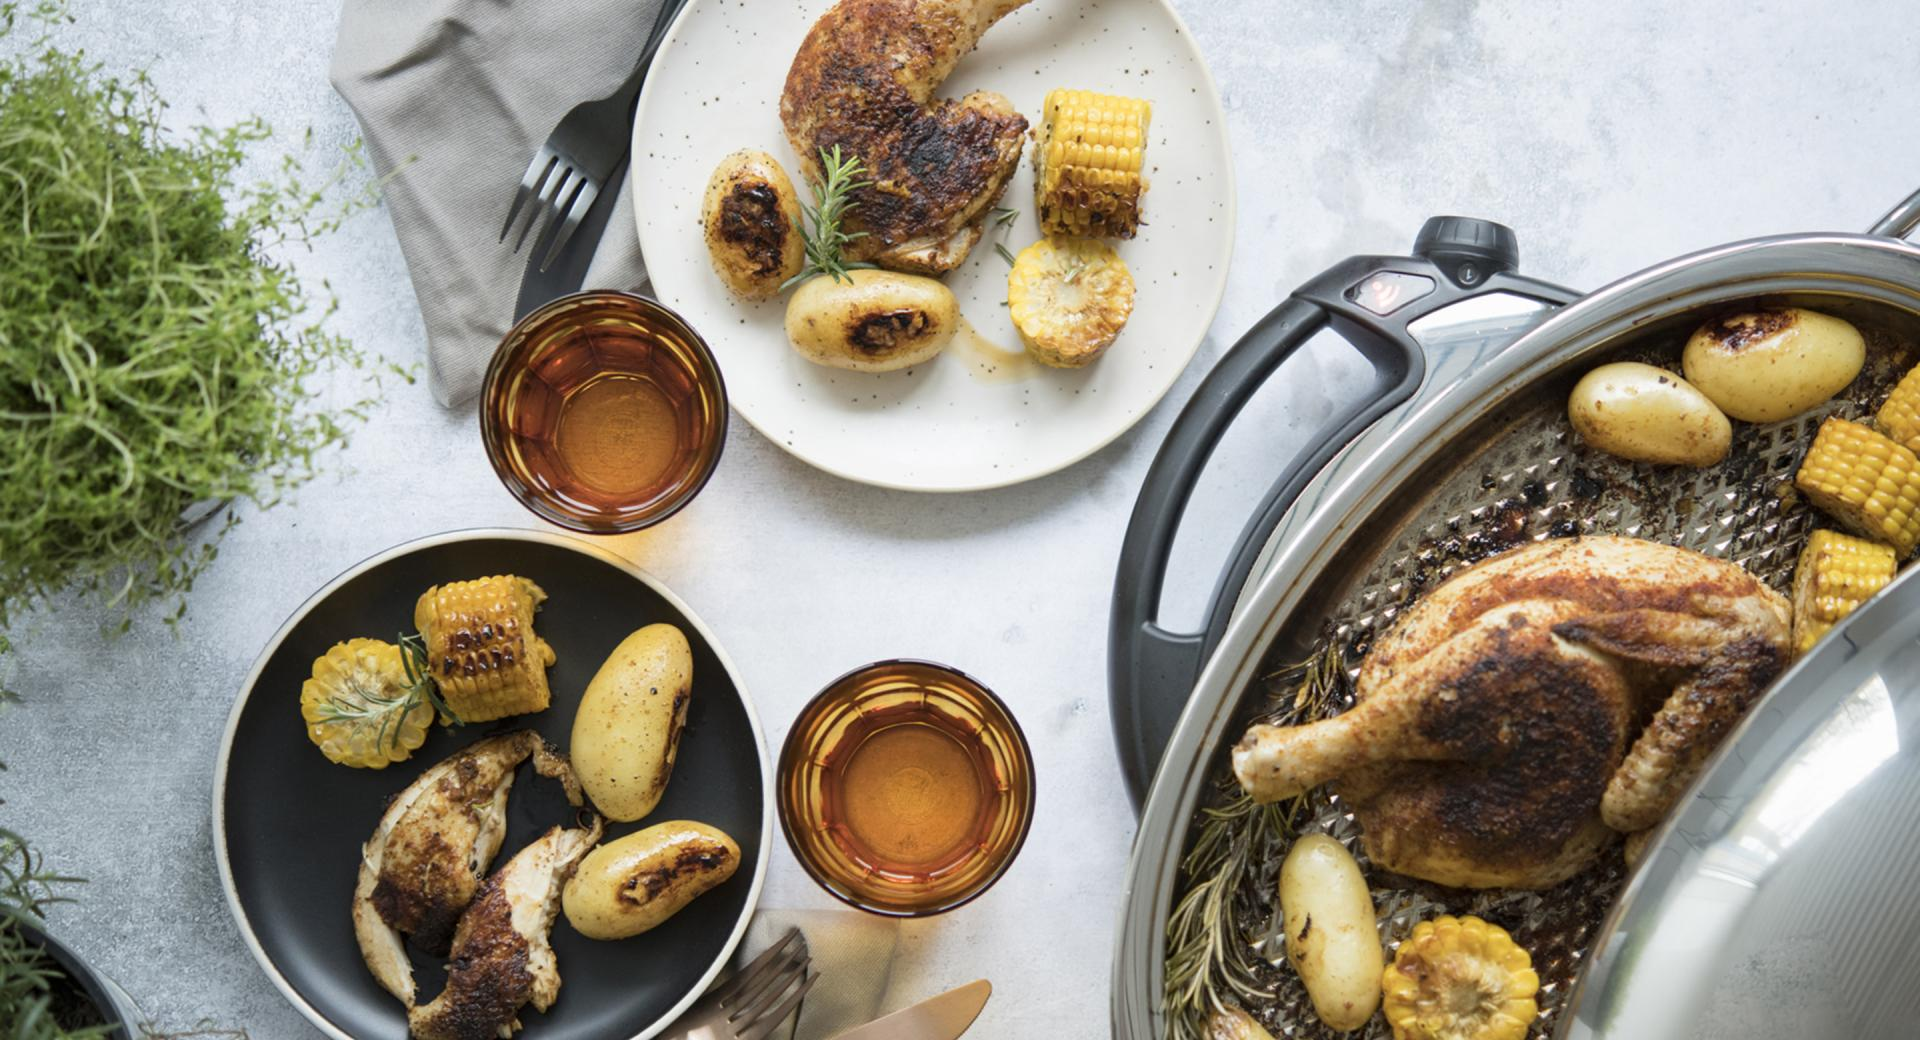 Pollo arrosto con patate e mais